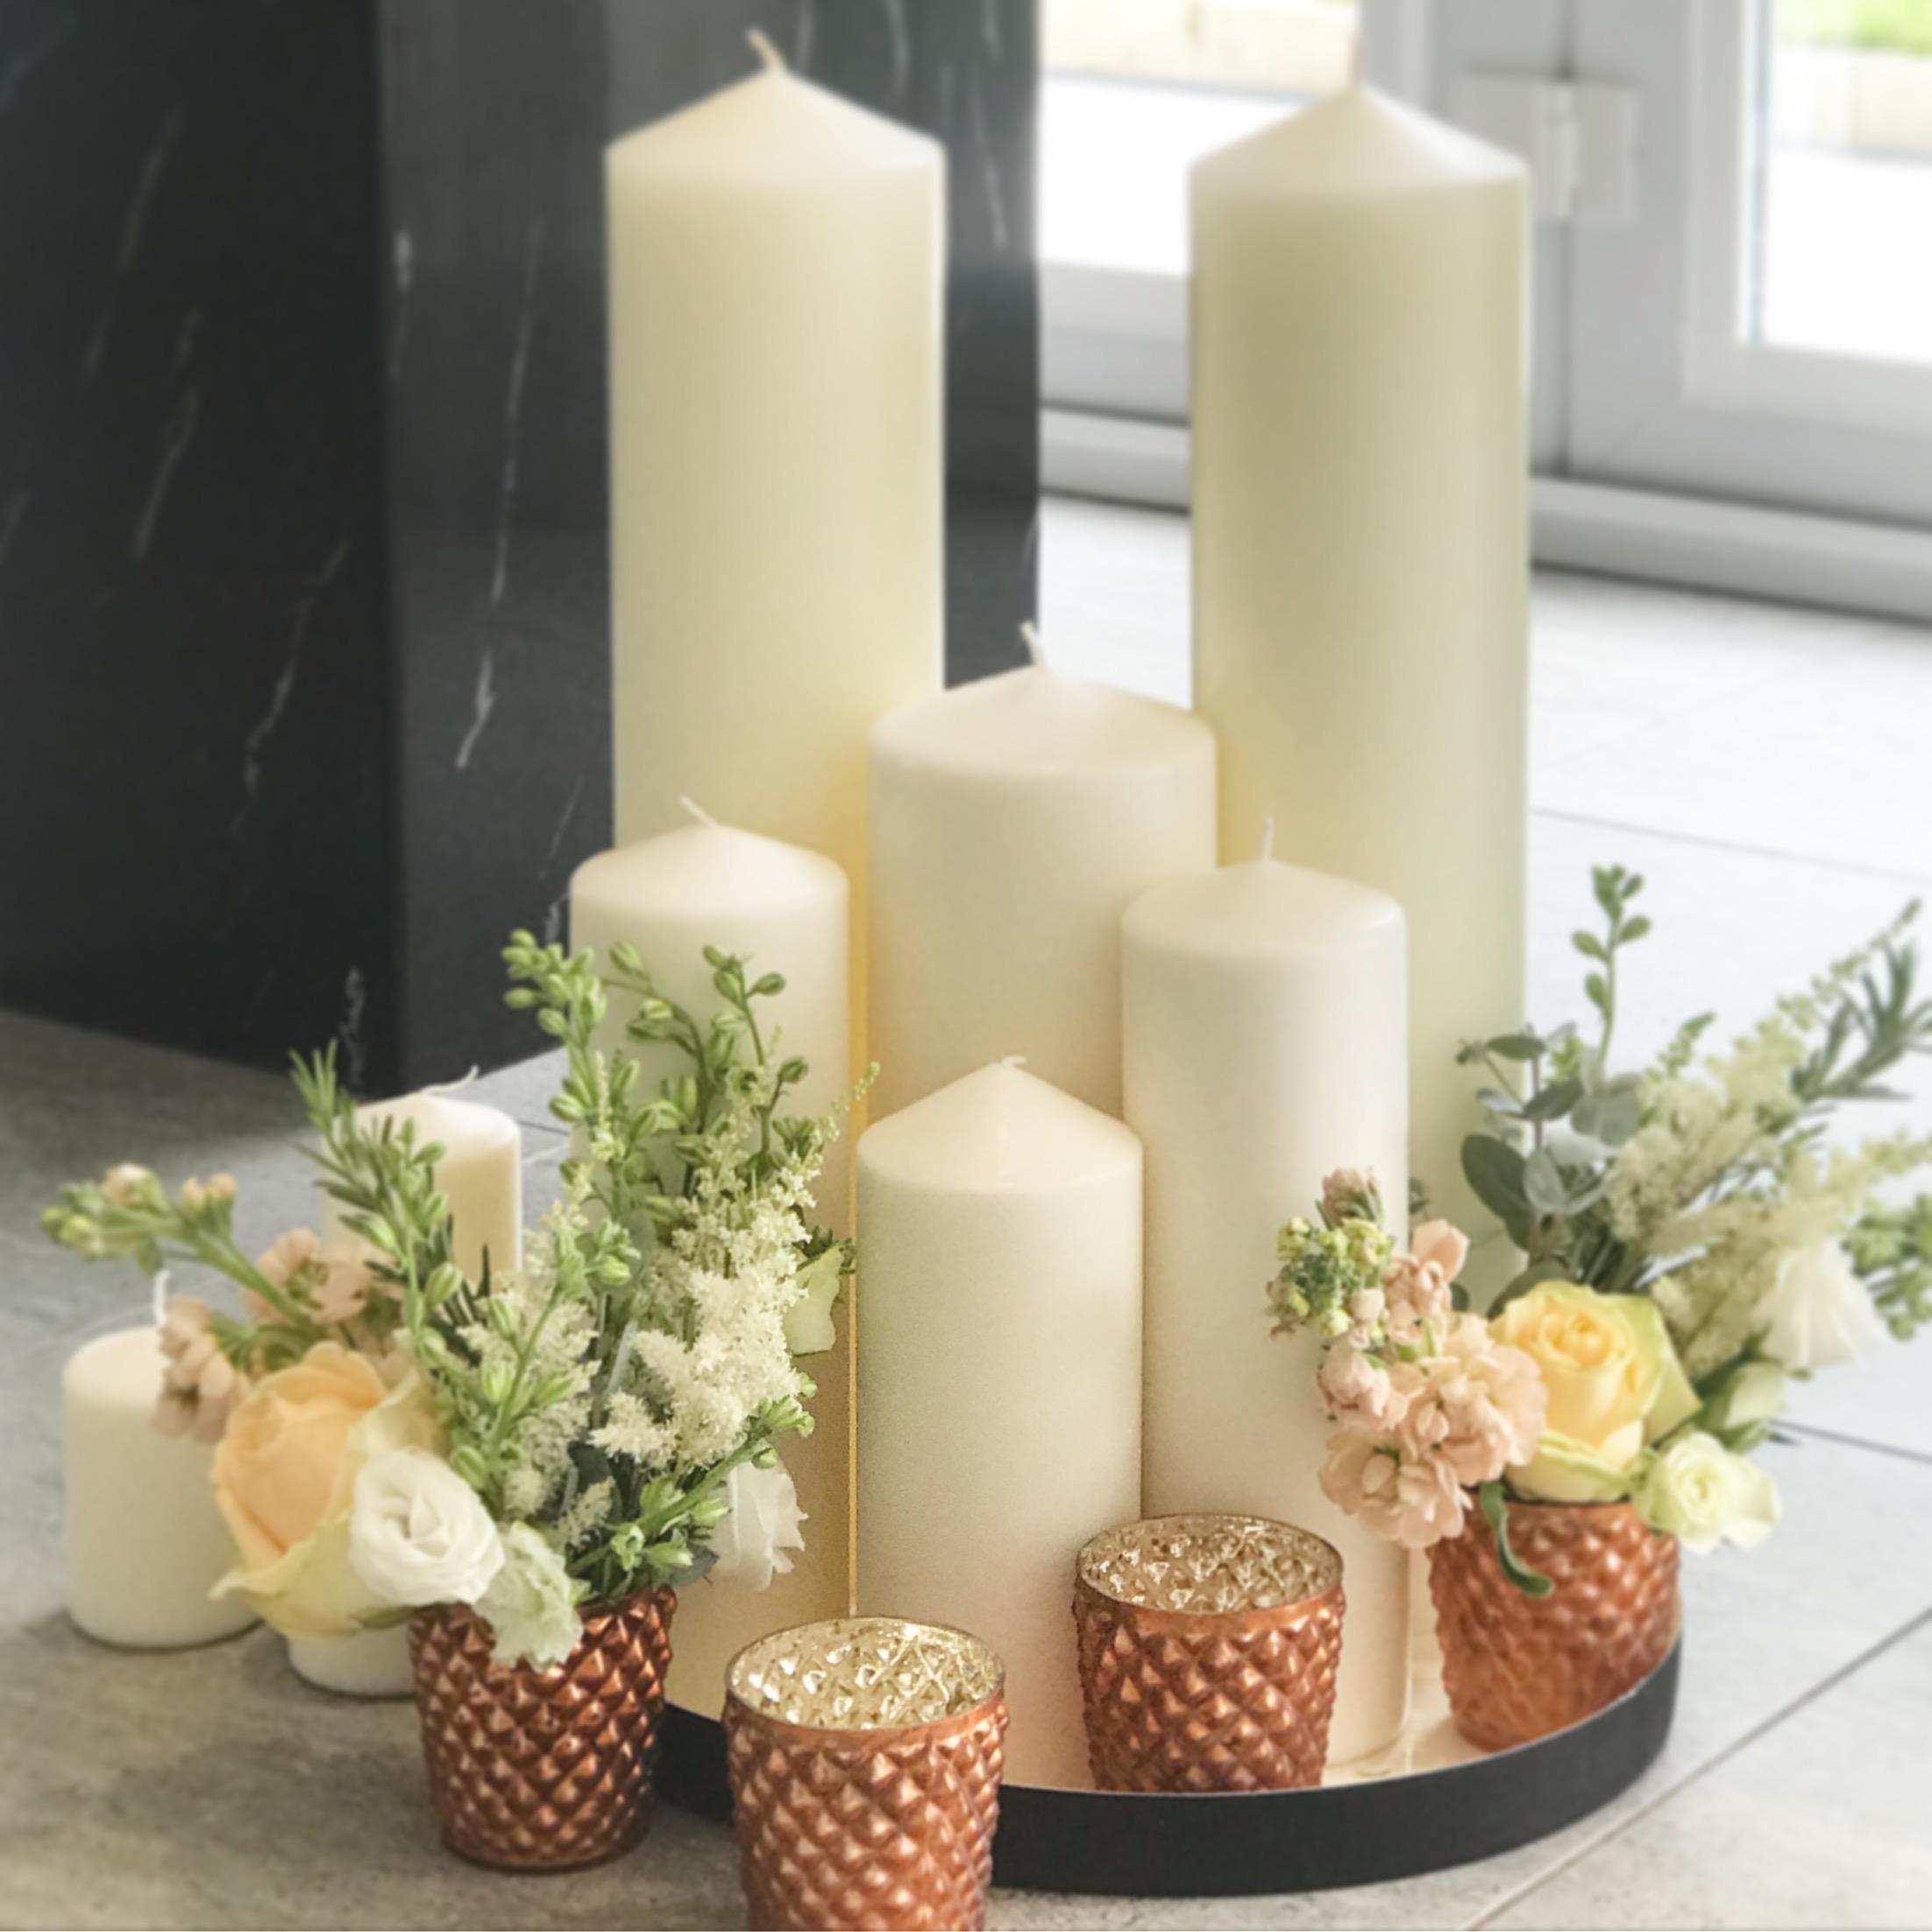 copper tea light holders The Wedding of my Dreams